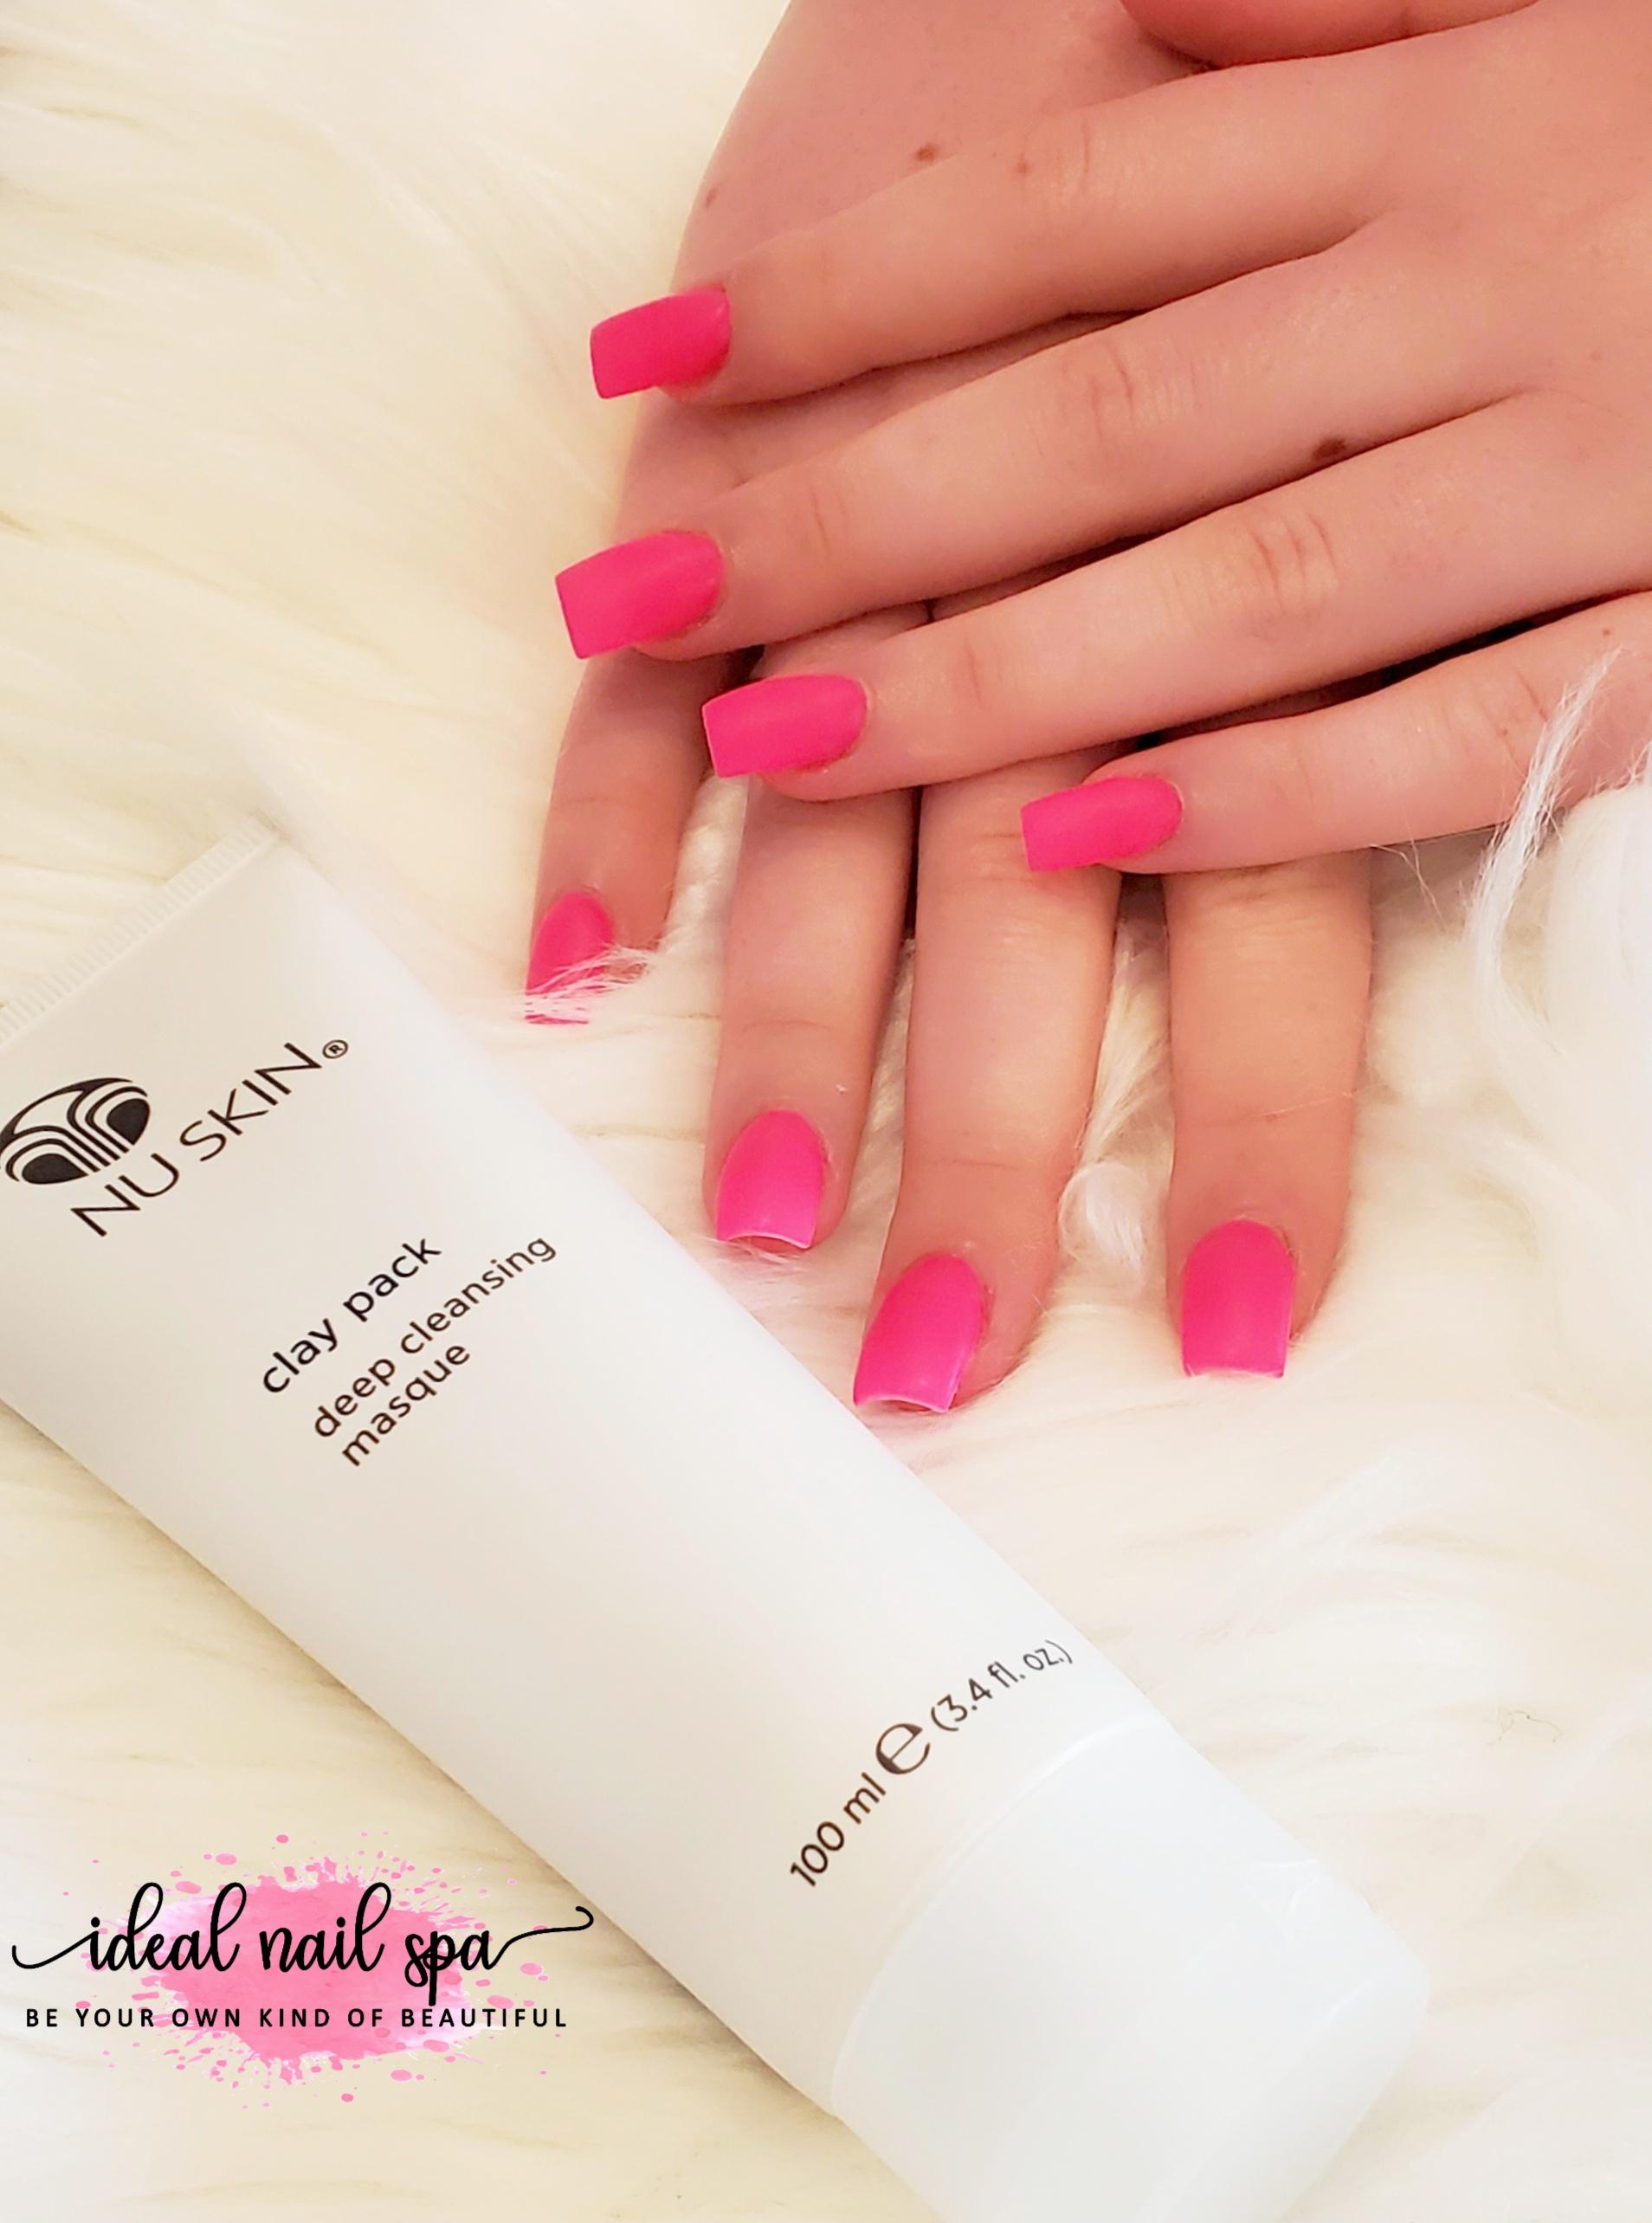 BeautyPlus_20200627141133932_save